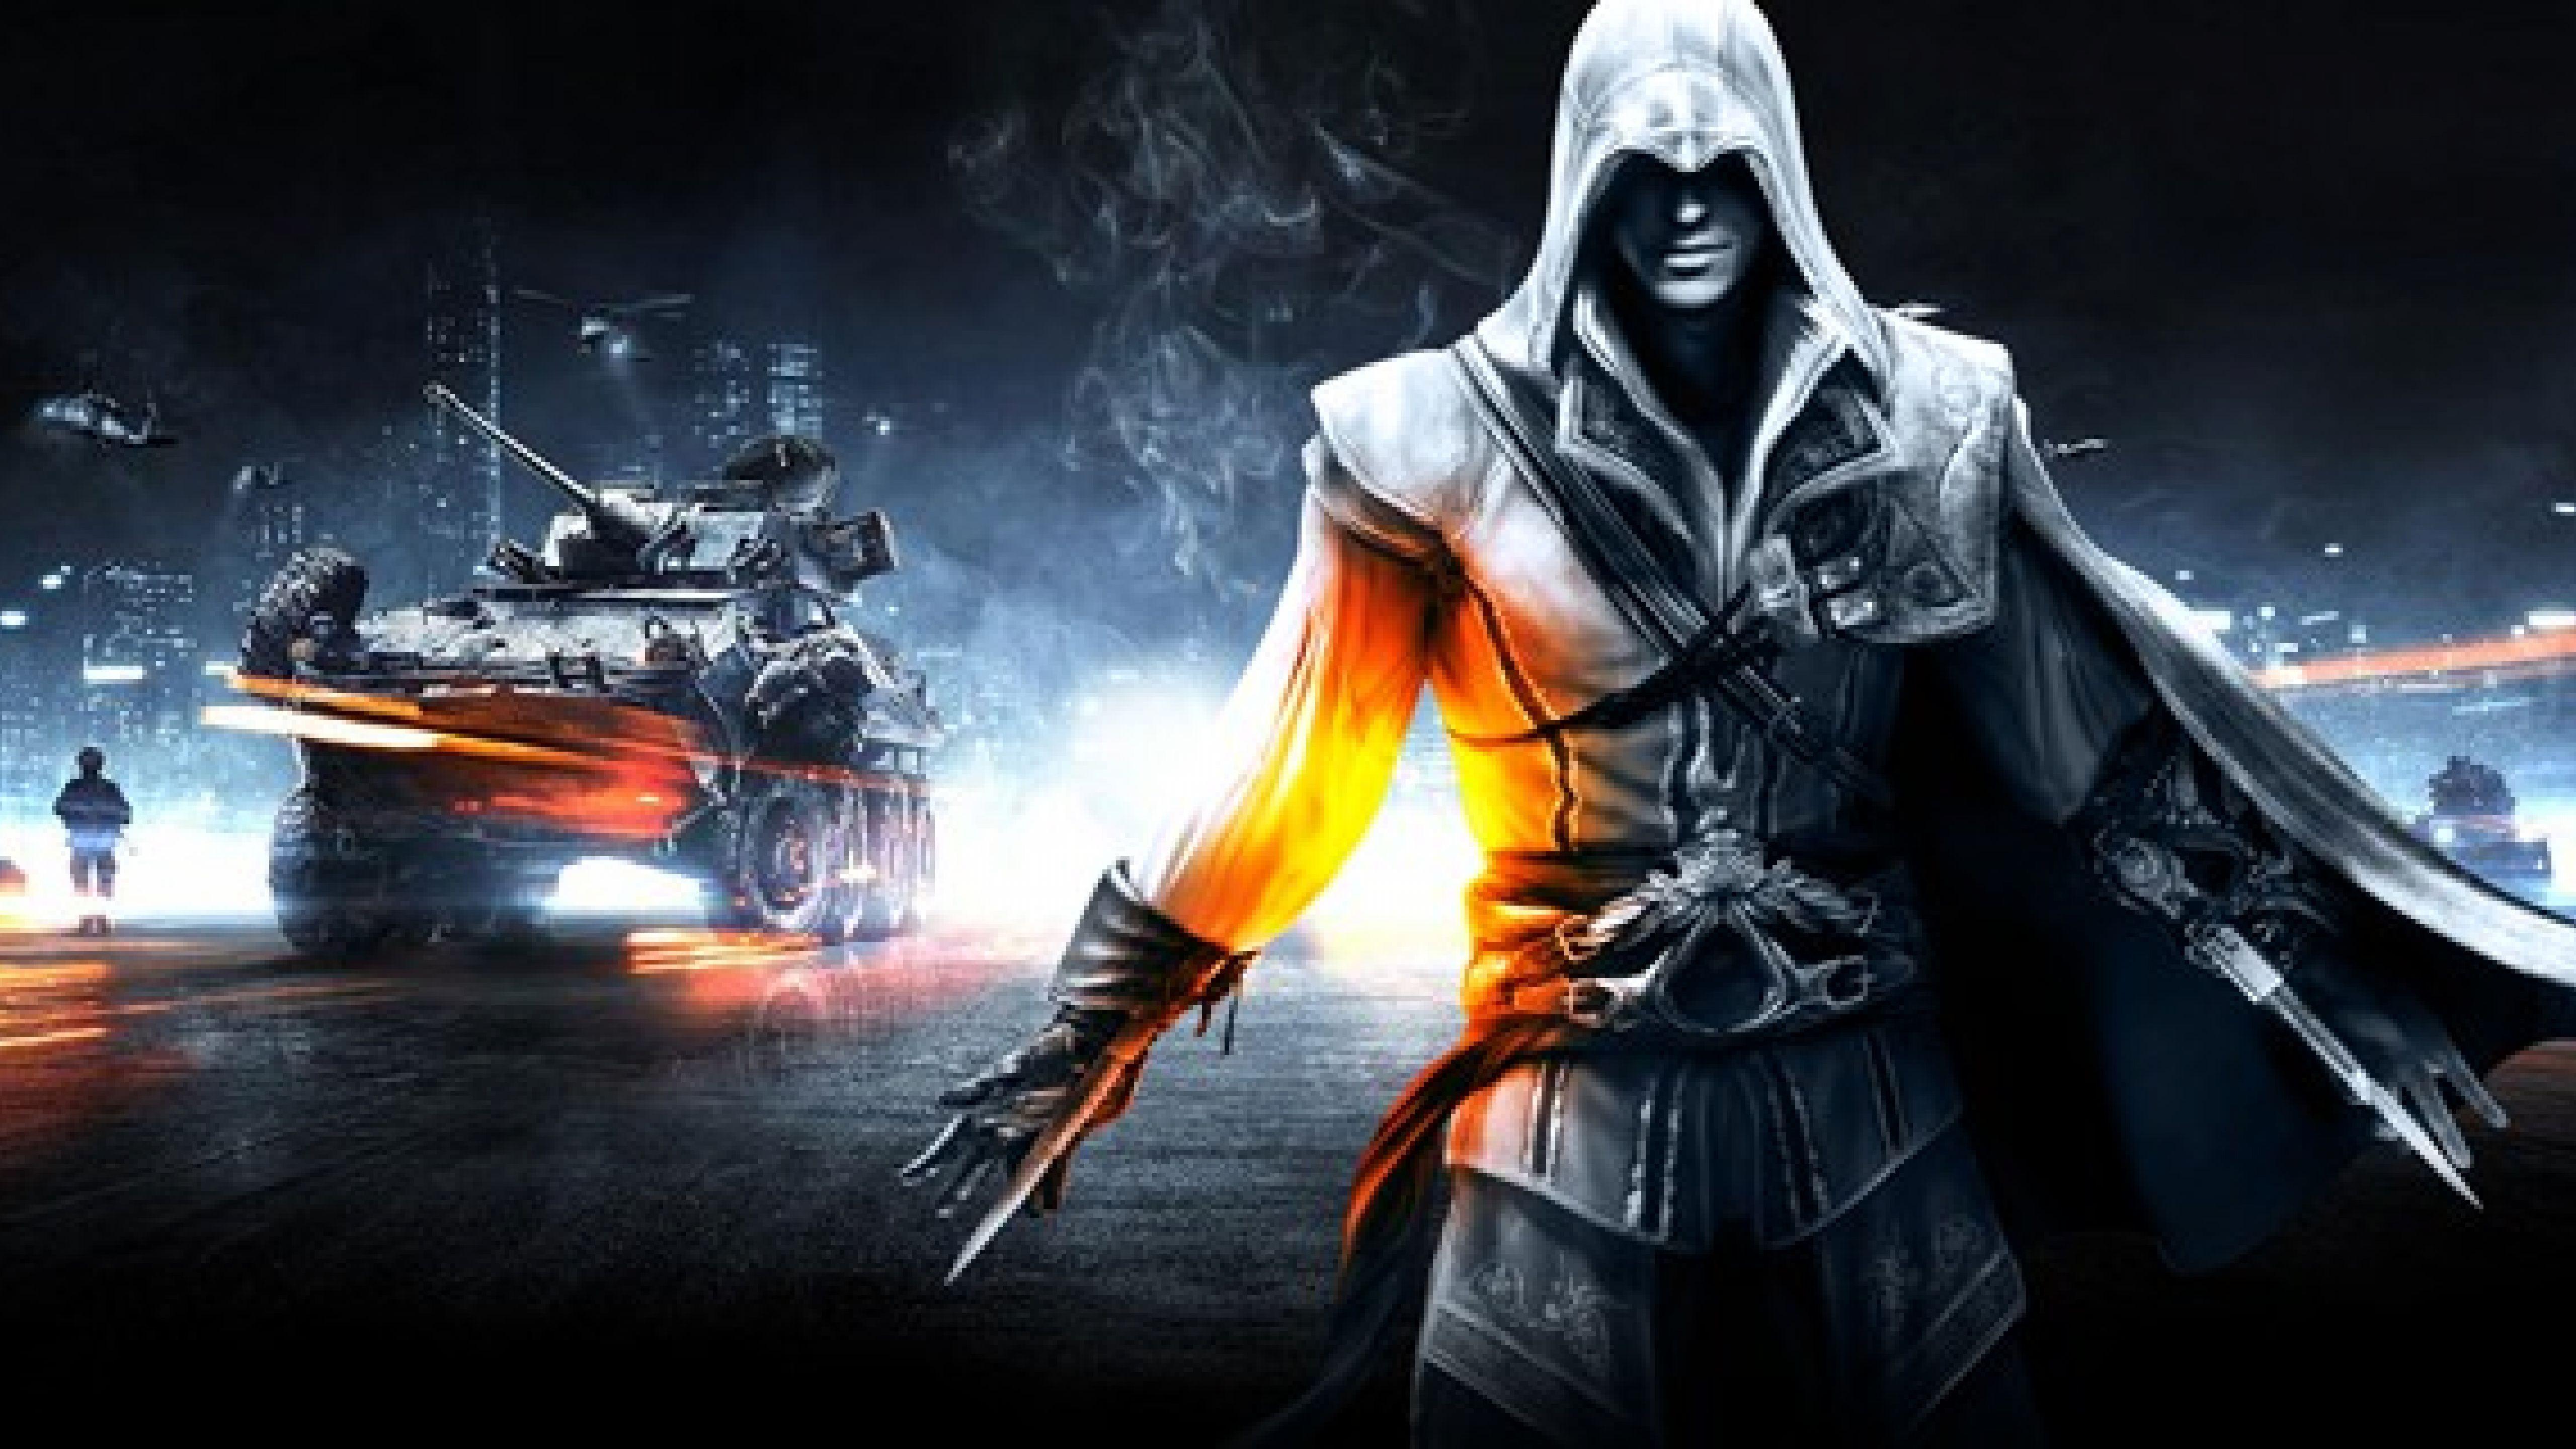 Download 500+ Wallpaper 3d Gamer HD Paling Baru